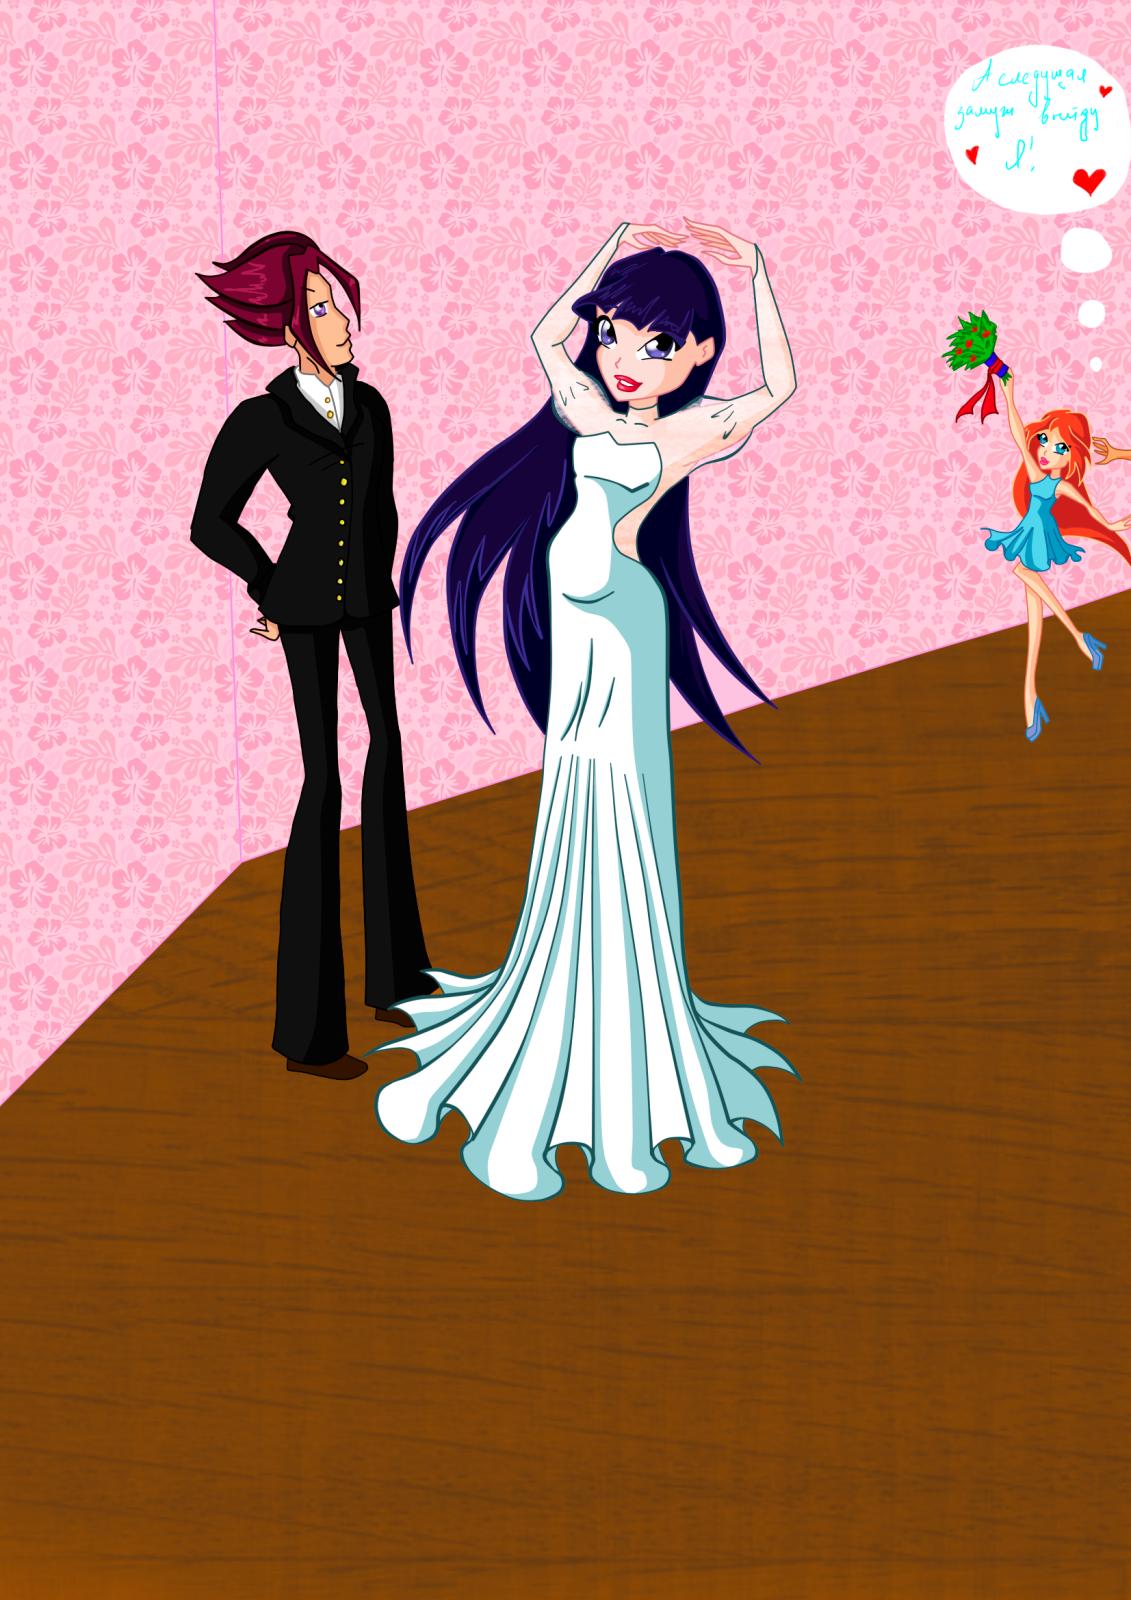 Фанарты мультфильмы винкс свадьба